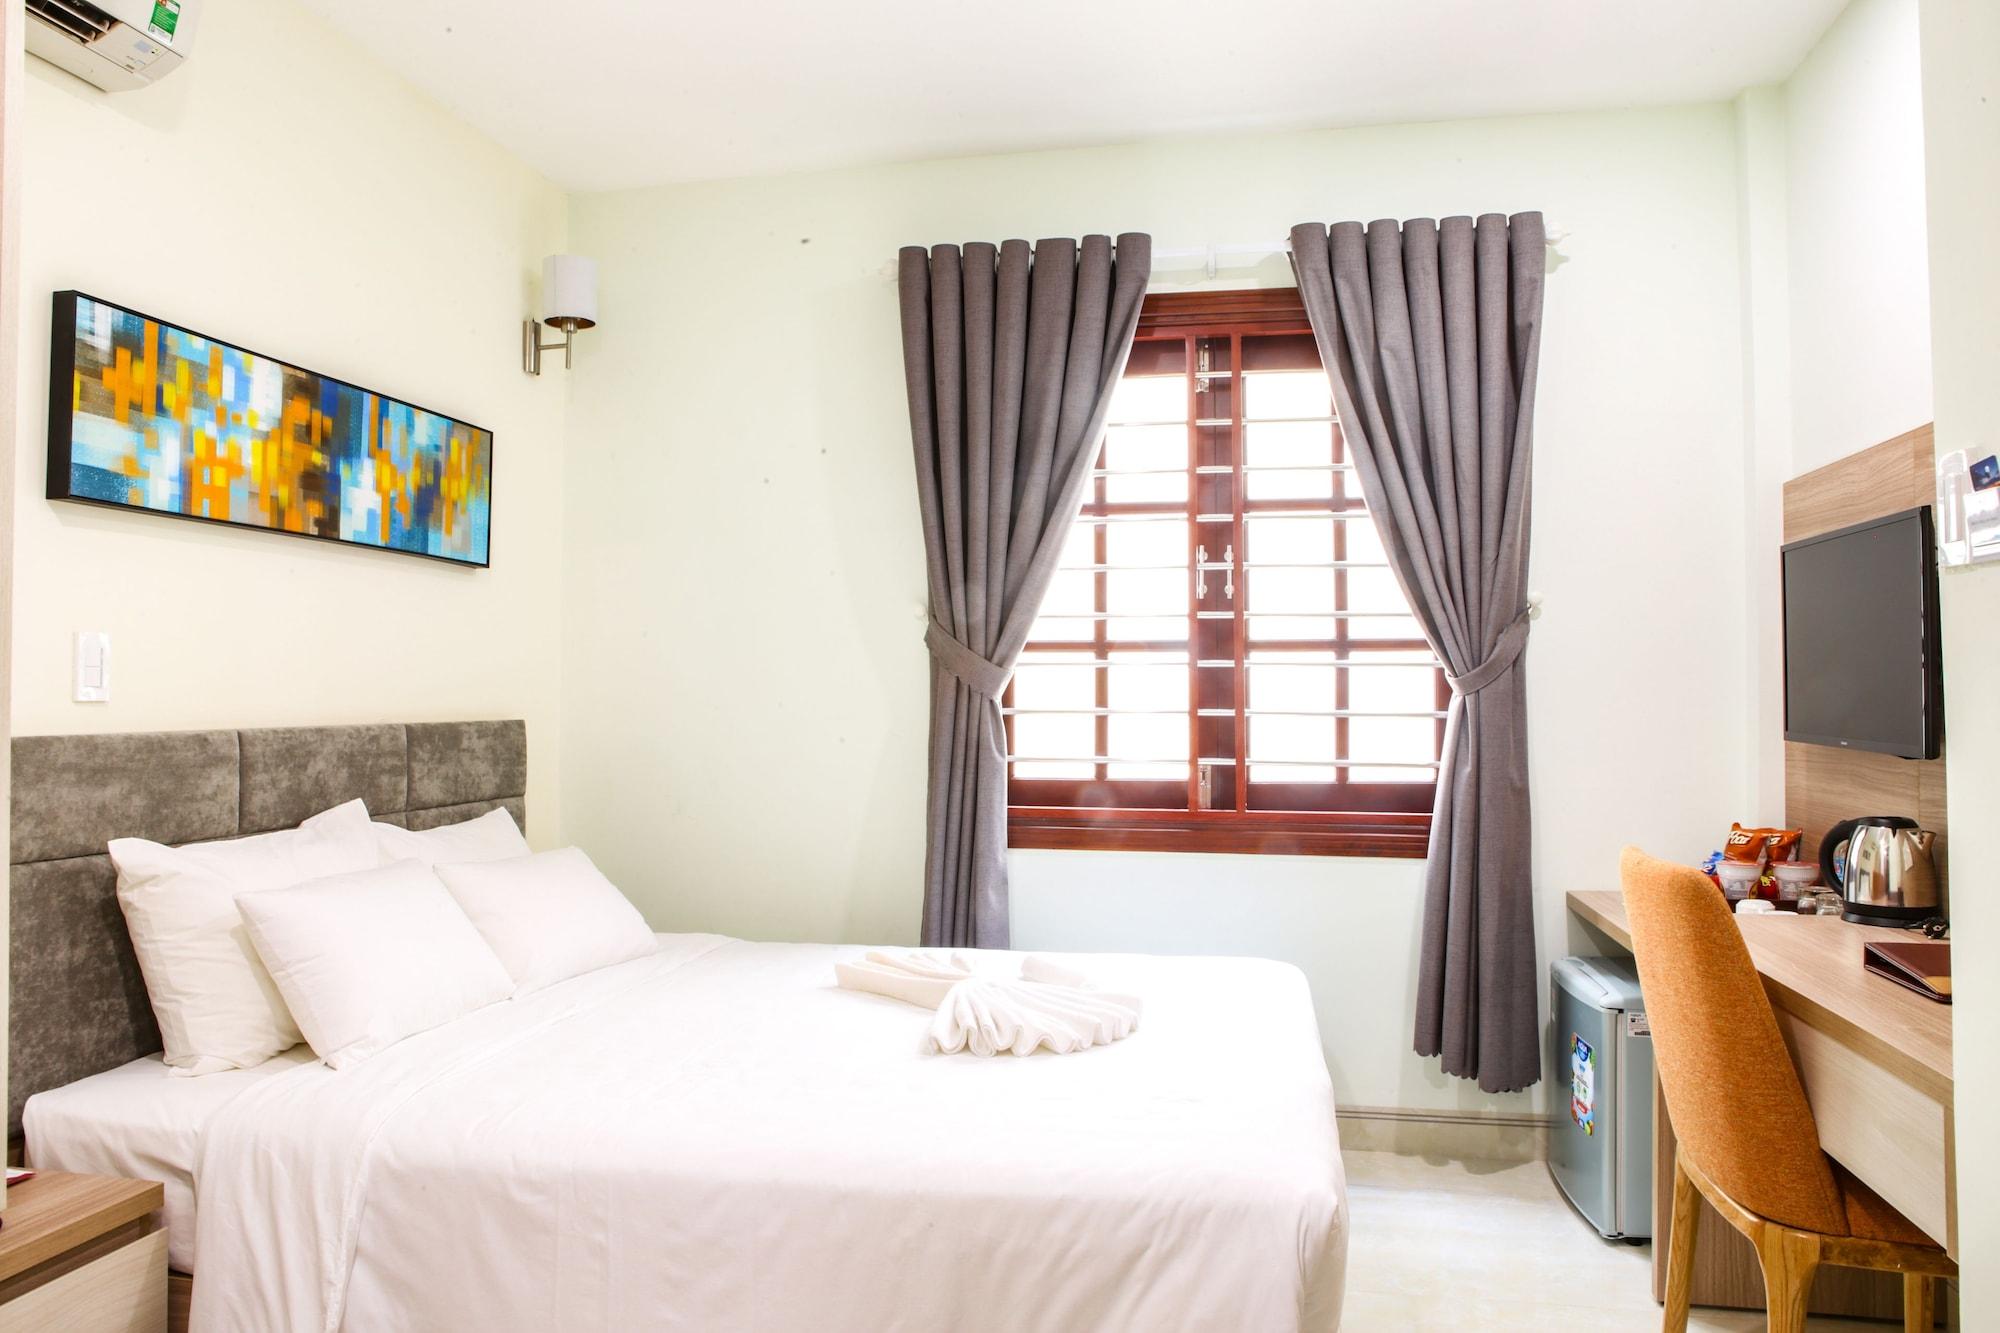 Lake View Hotel, Qui Nhơn